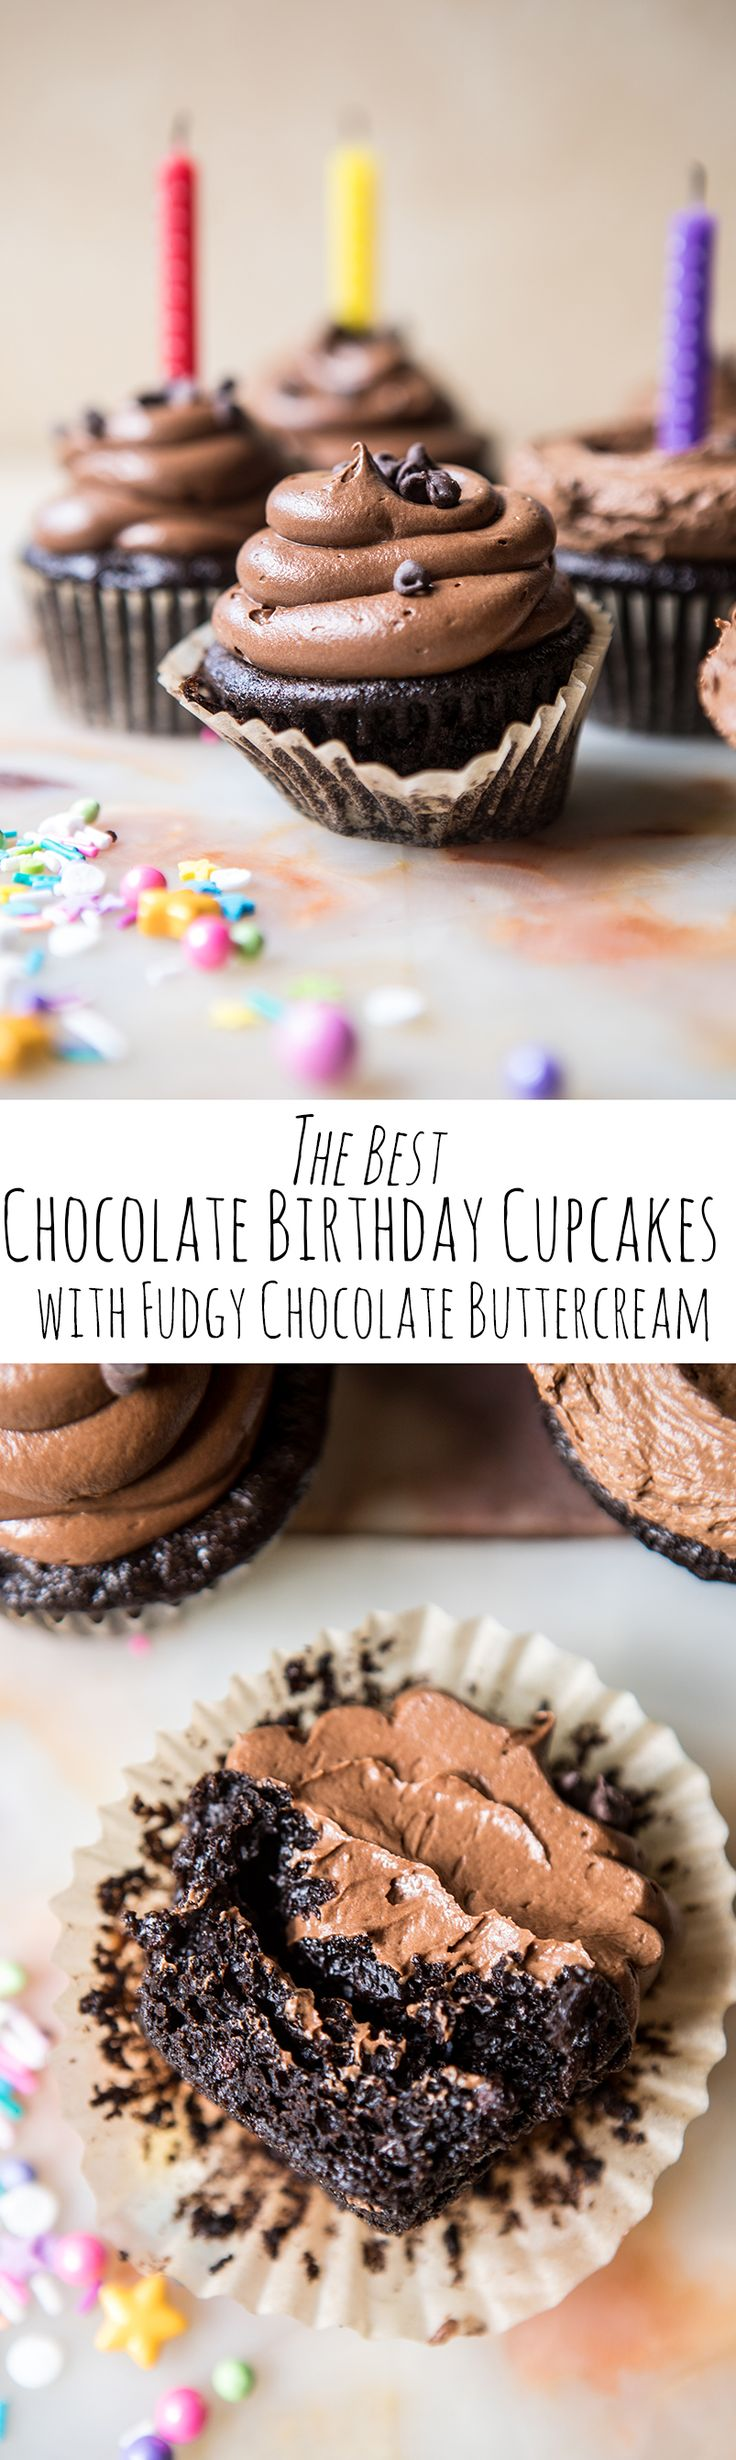 The Best Chocolate Birthday Cupcakes...with Fudgy Chocolate Buttercream | halfbakedharvest.com @hbharvest